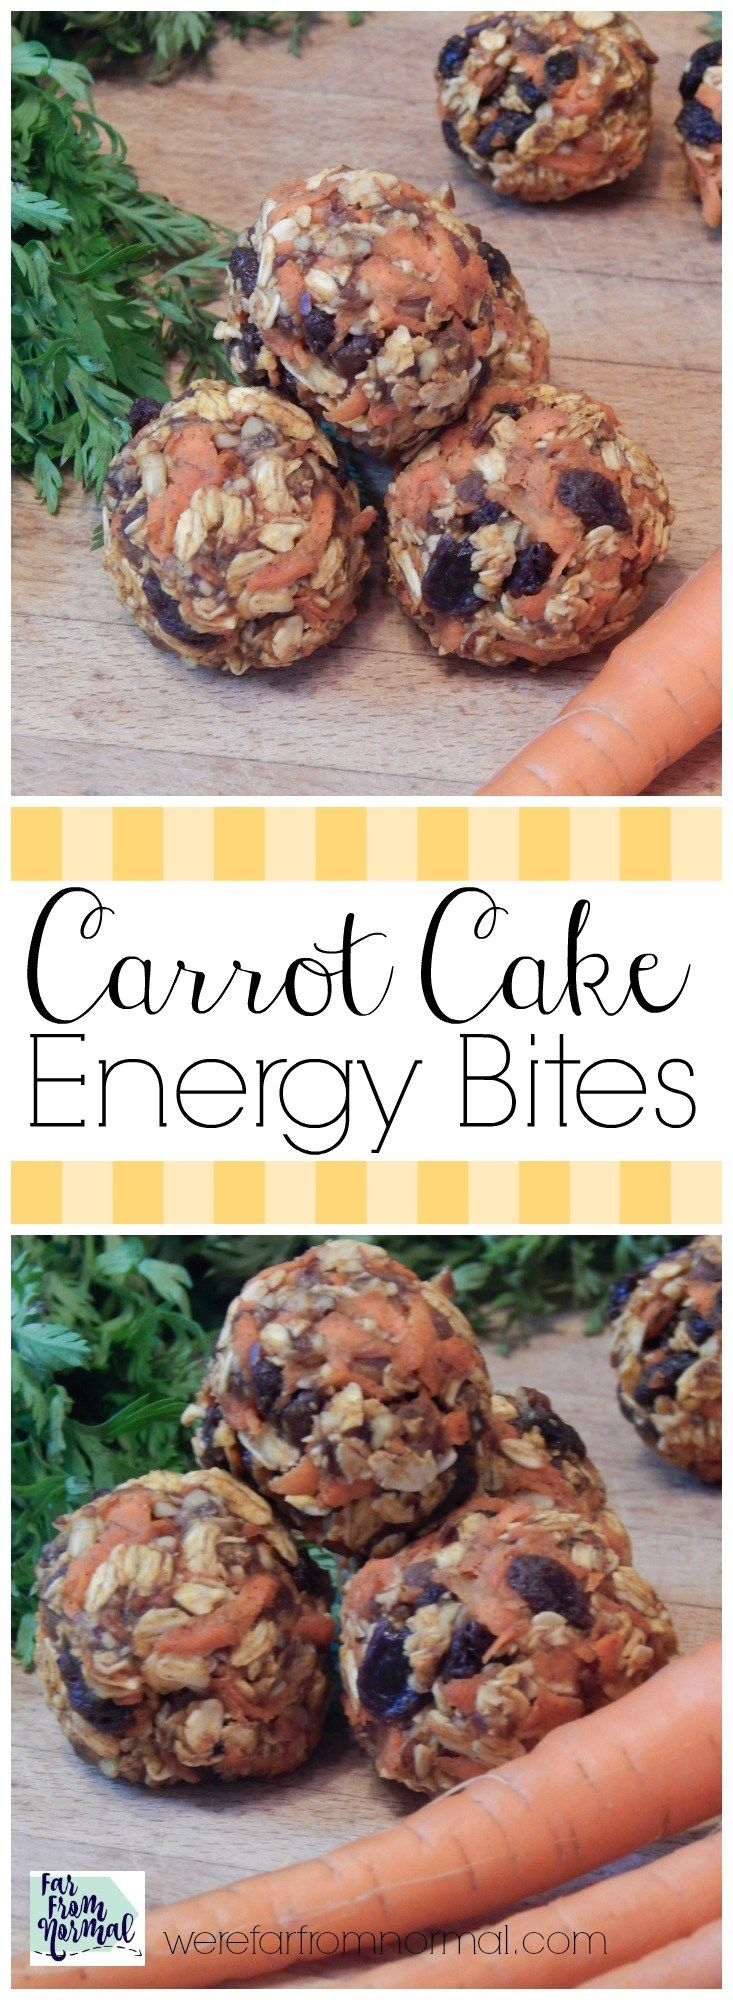 Park Art My WordPress Blog_Is Nemos Carrot Cake Healthy